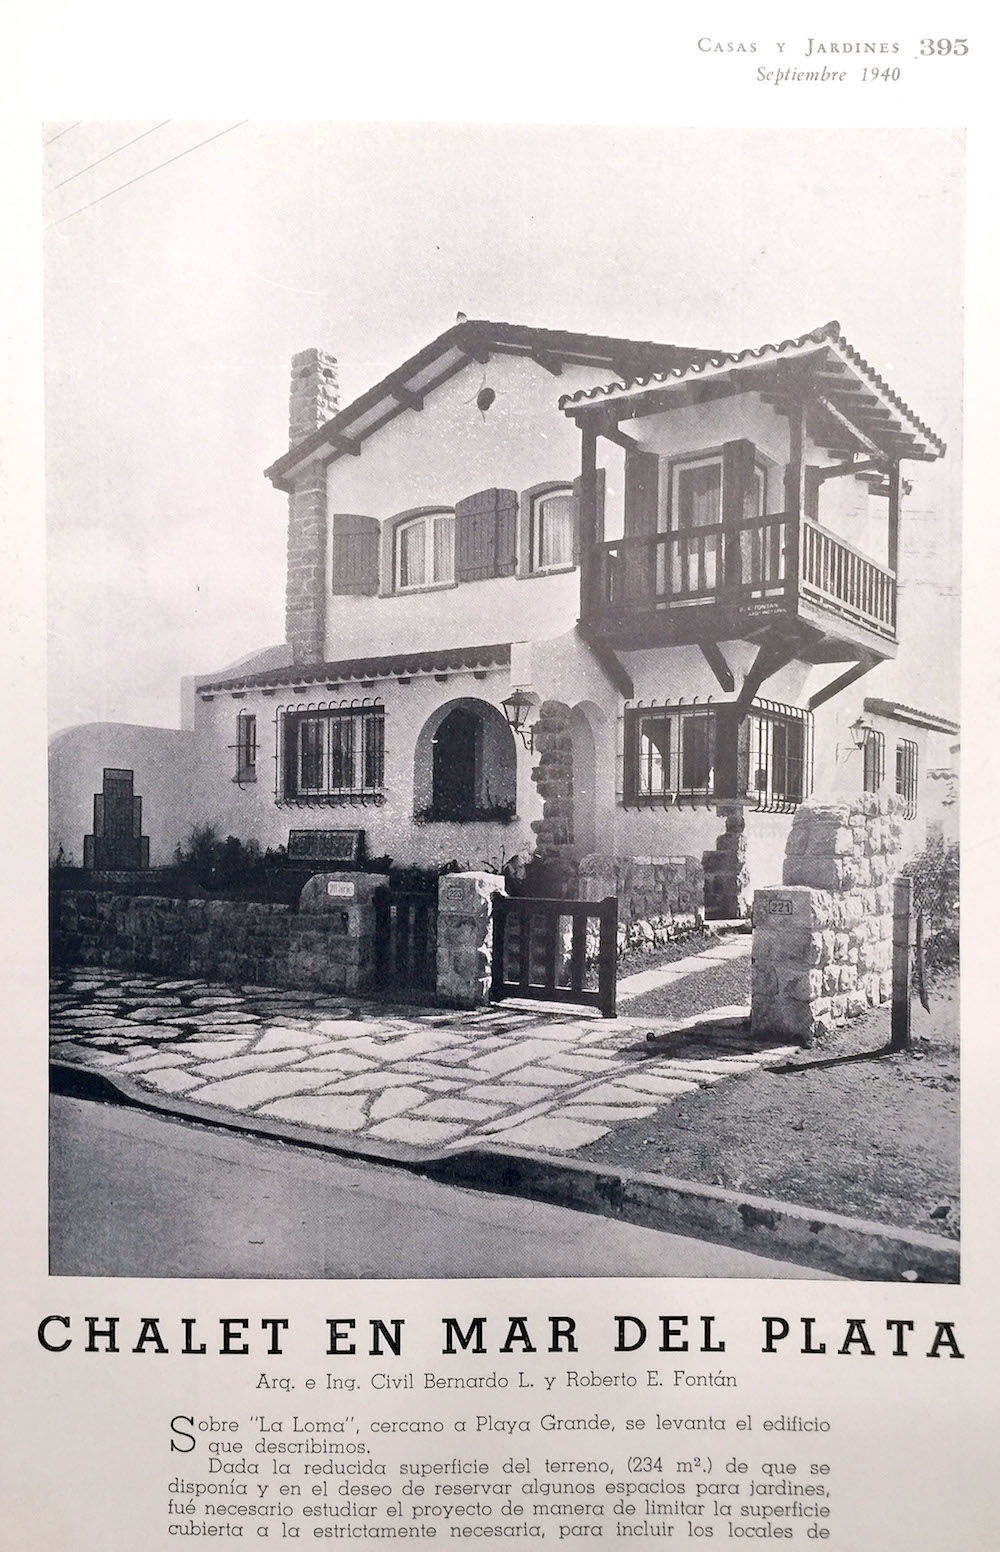 10401 fotos de familia for Casa jardin de la plata